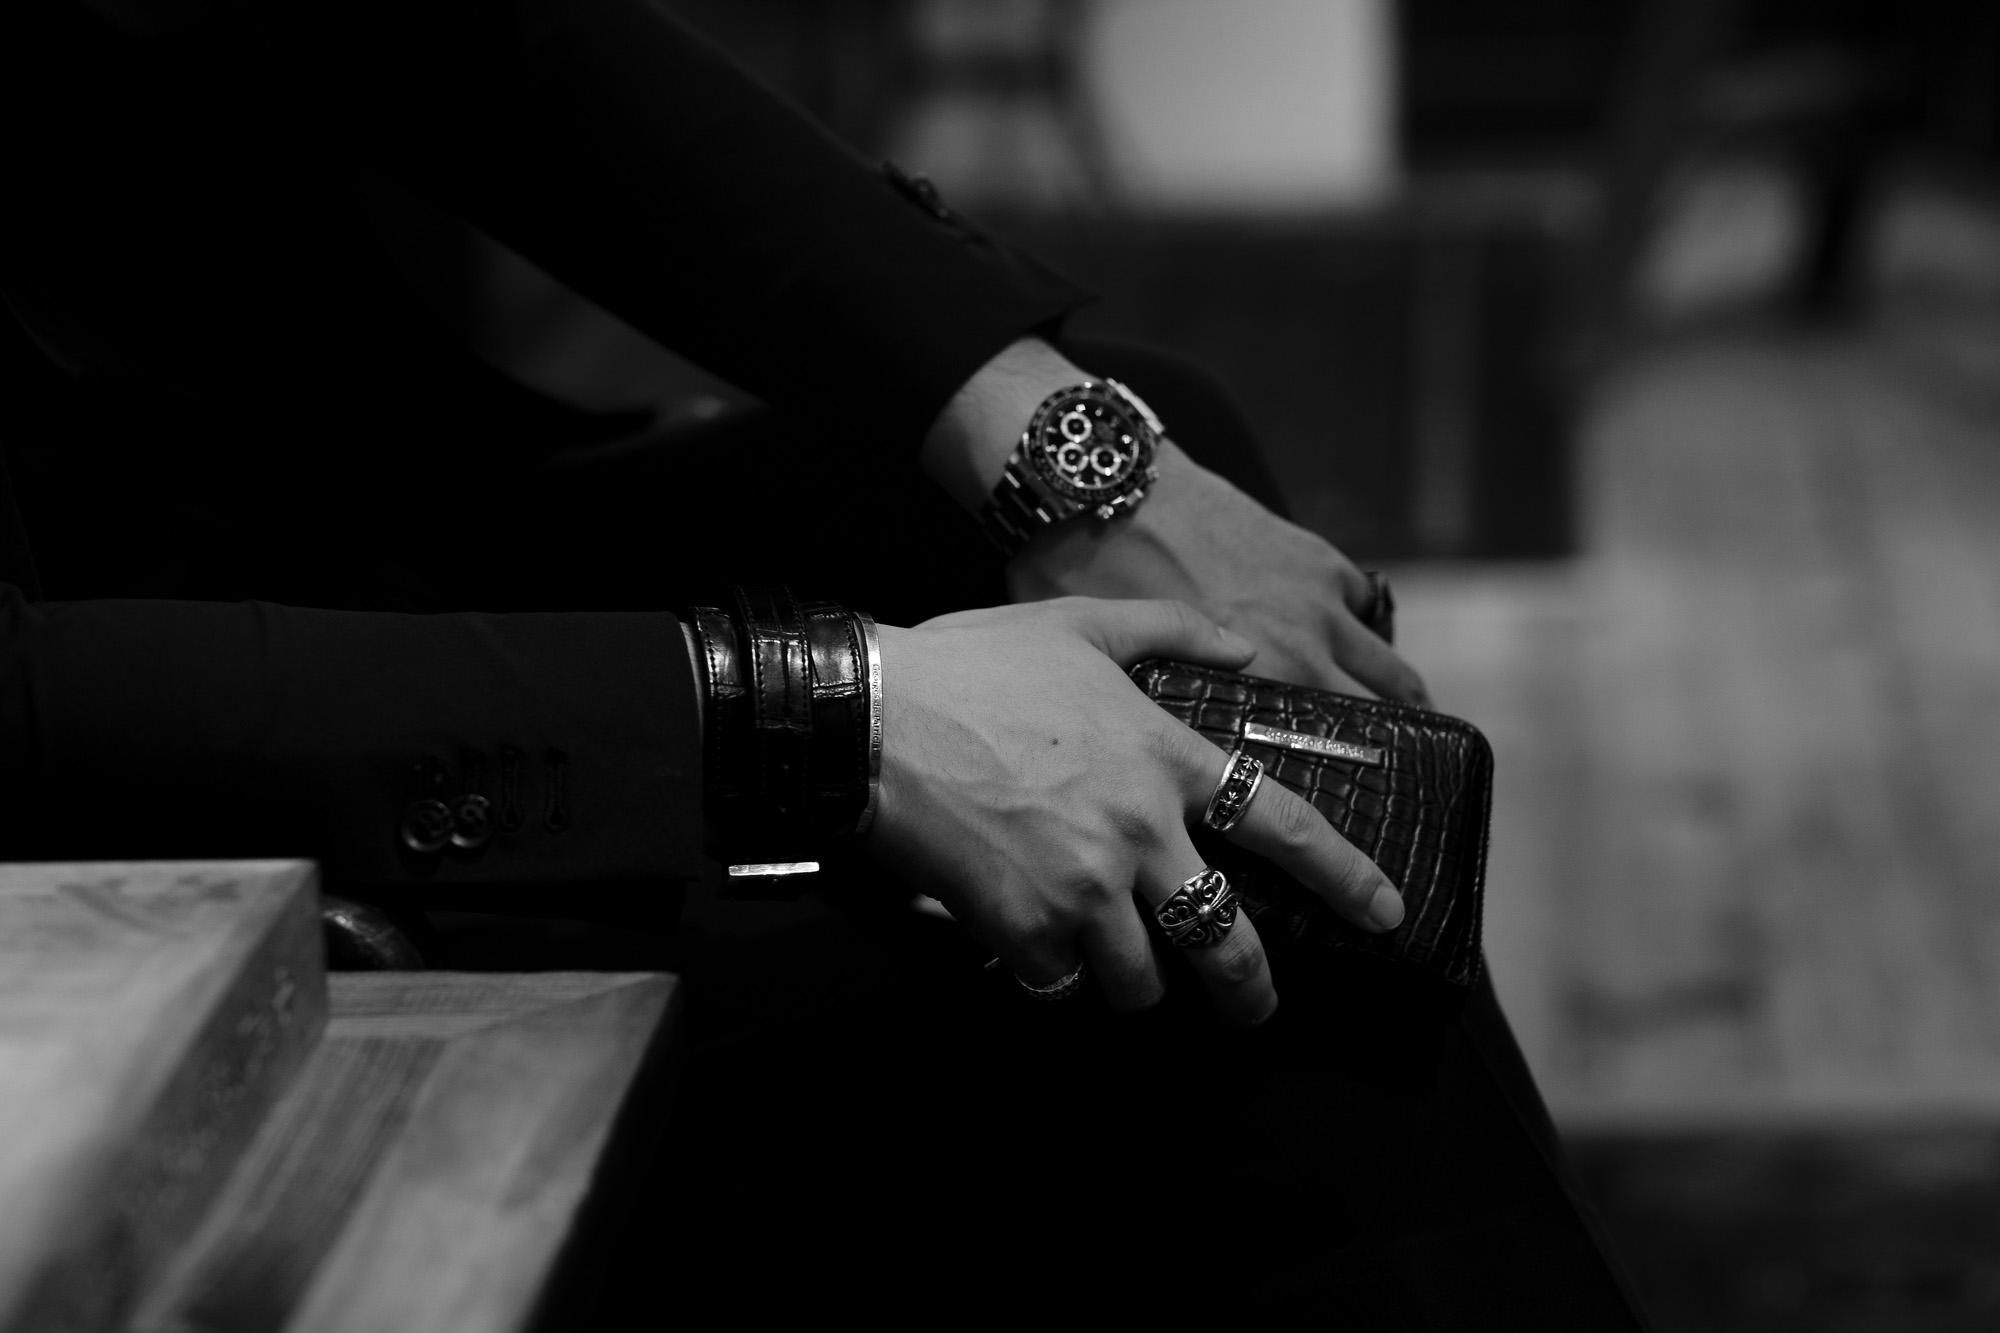 FIXER(フィクサー) CROCODILE LEATHER BRACELET 925 STERLING SILVER(925 スターリングシルバー) クロコダイル レザー ブレスレット BLACK (ブラック) 【ご予約受付中】 愛知 名古屋 altoediritto アルトエデリット クロコダイル ブレスレット バングル